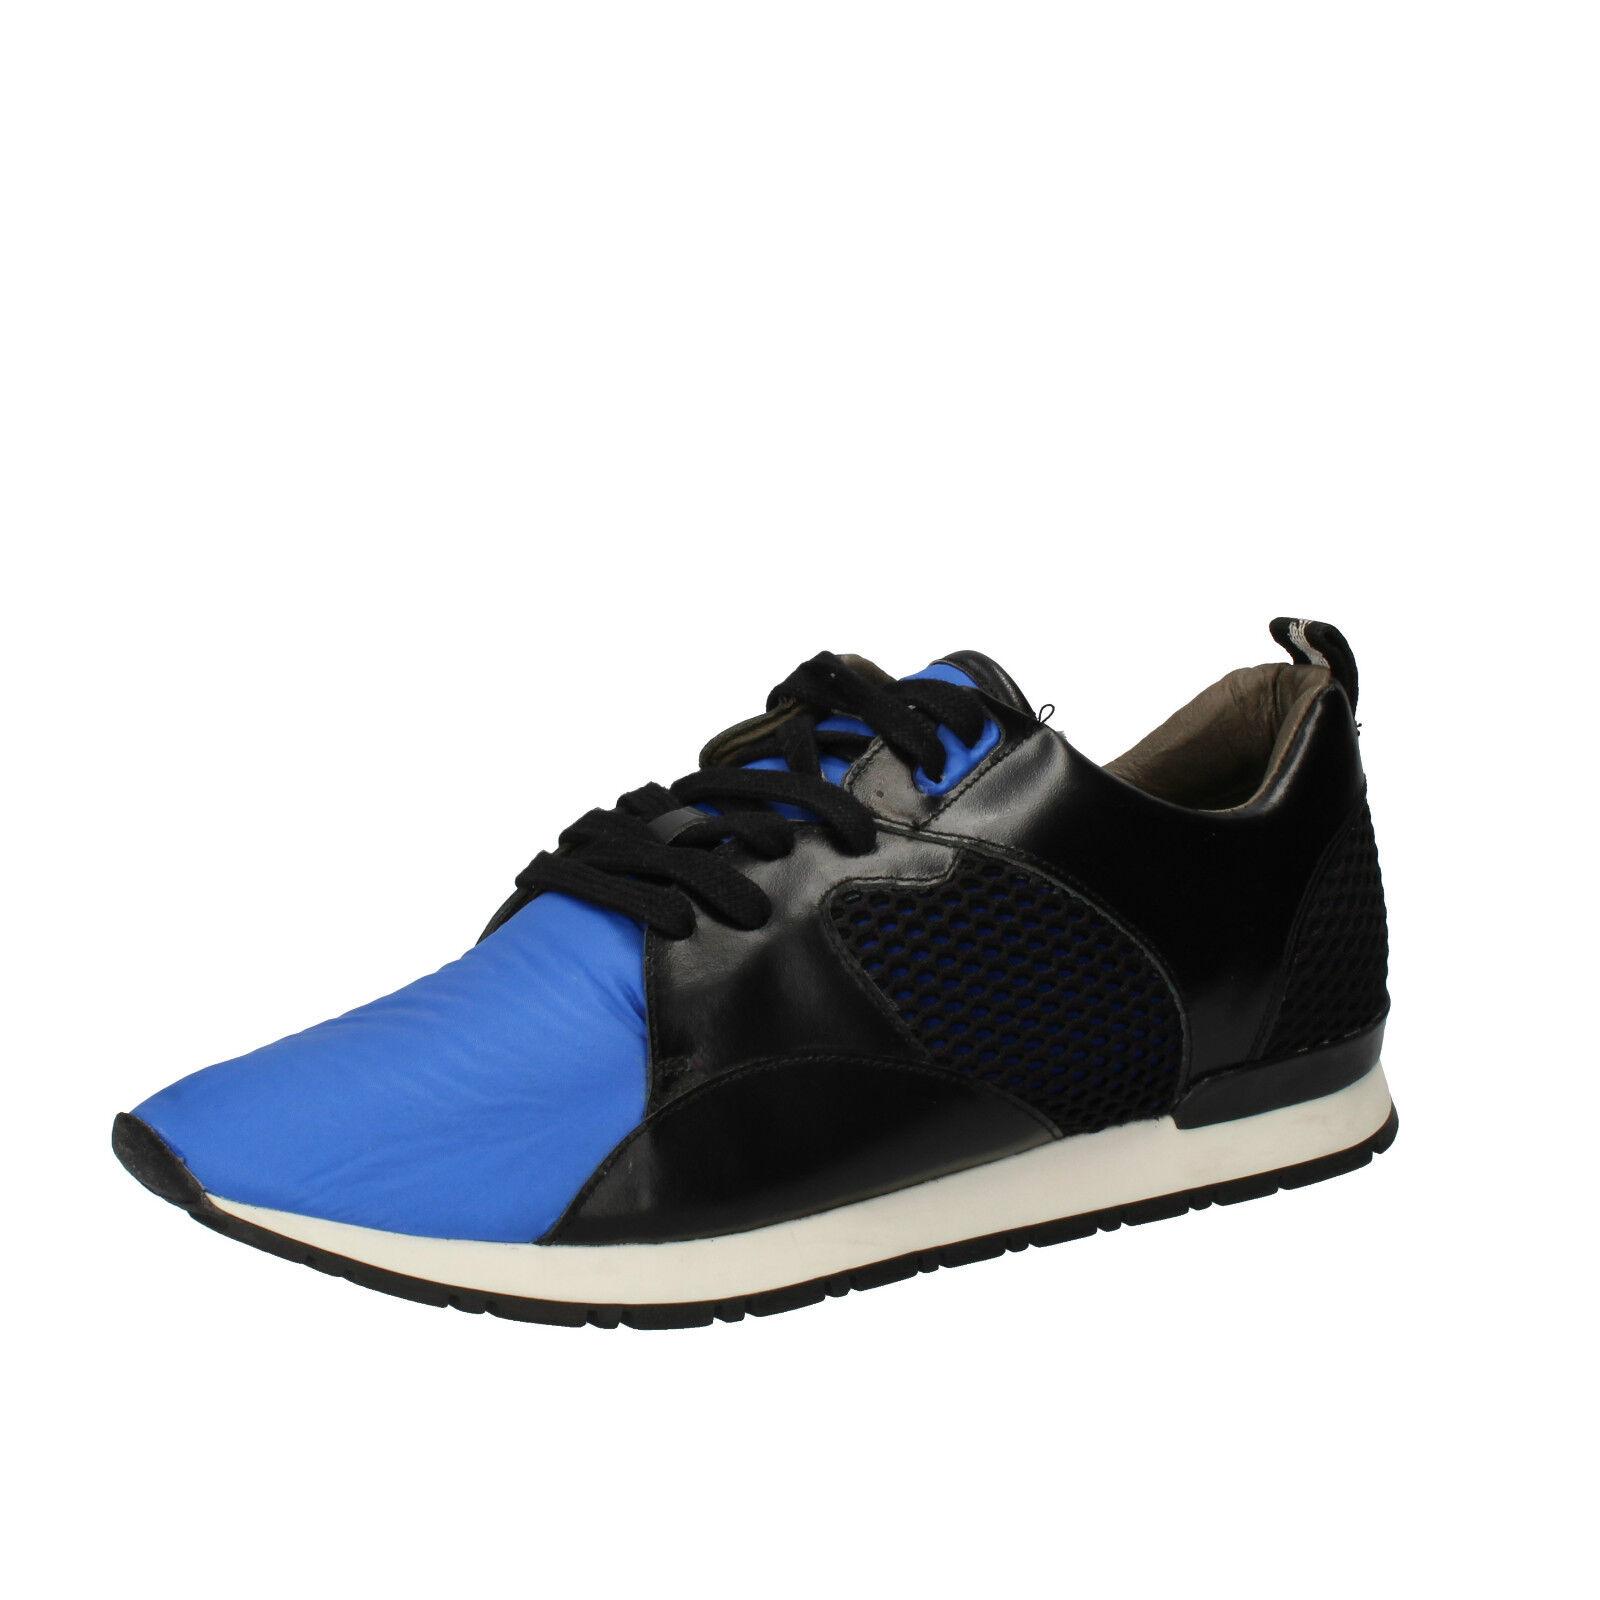 herren schuhe D.A.T.E. (date) 43 EU sneakers schwarz blau leder textil AE534-43